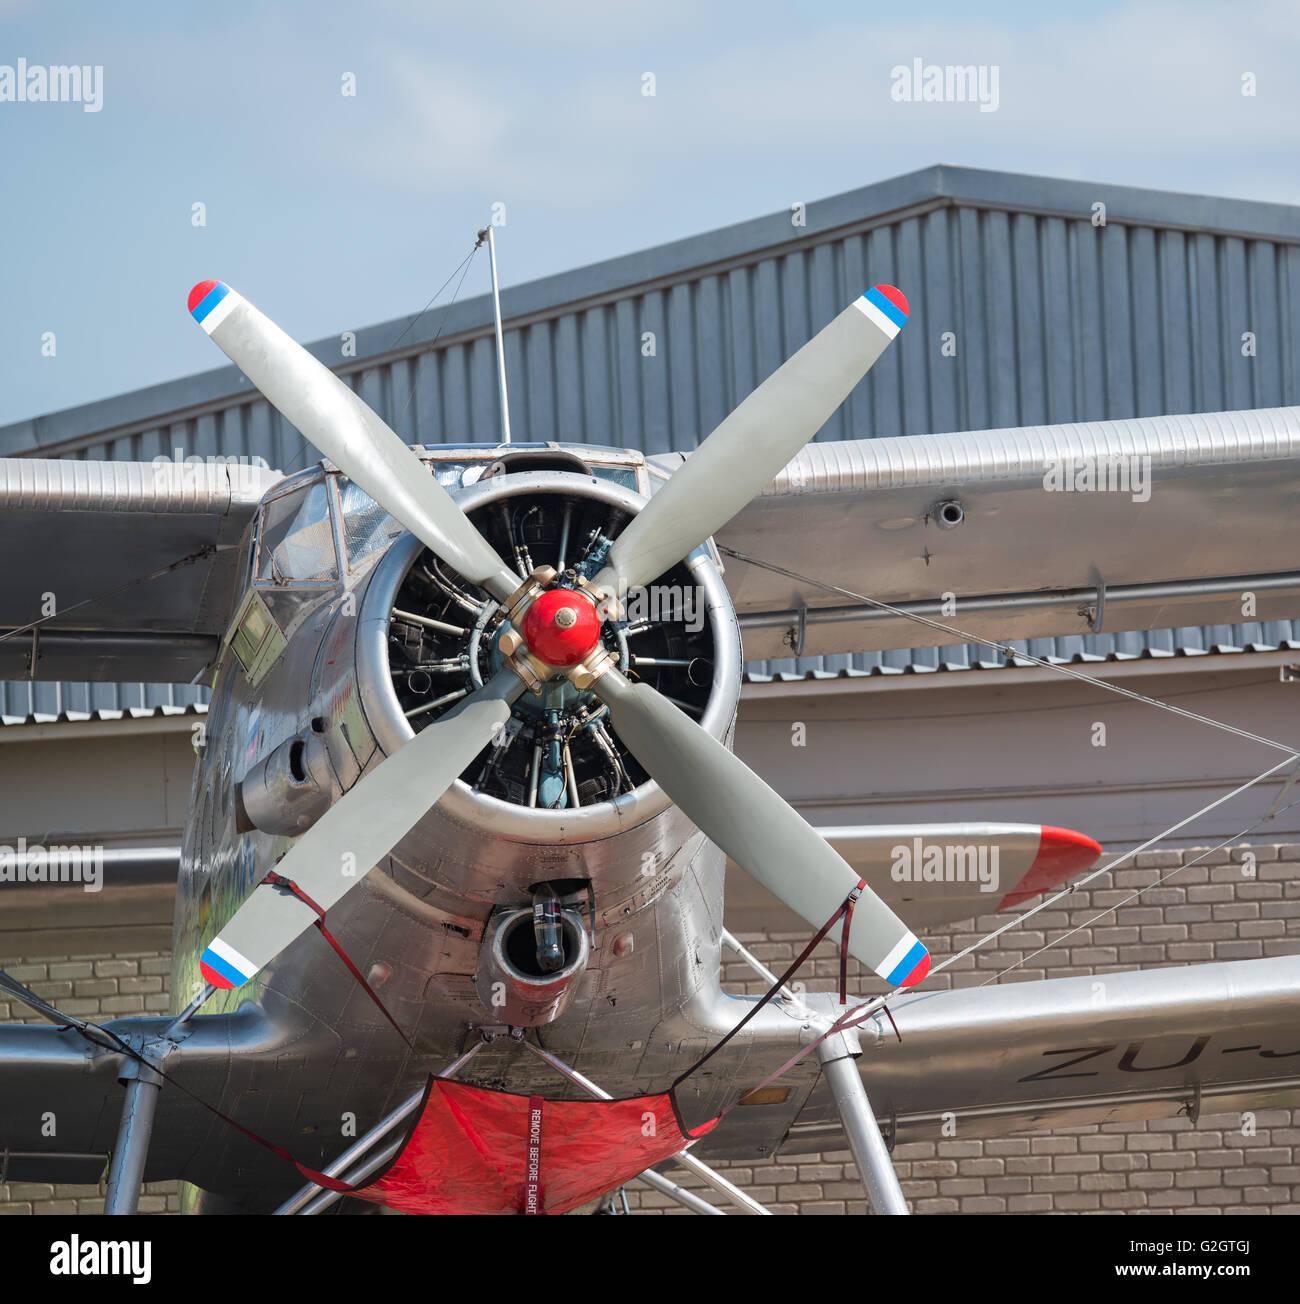 The propeller of the Antonov AN-2 aircraft - Stock Image